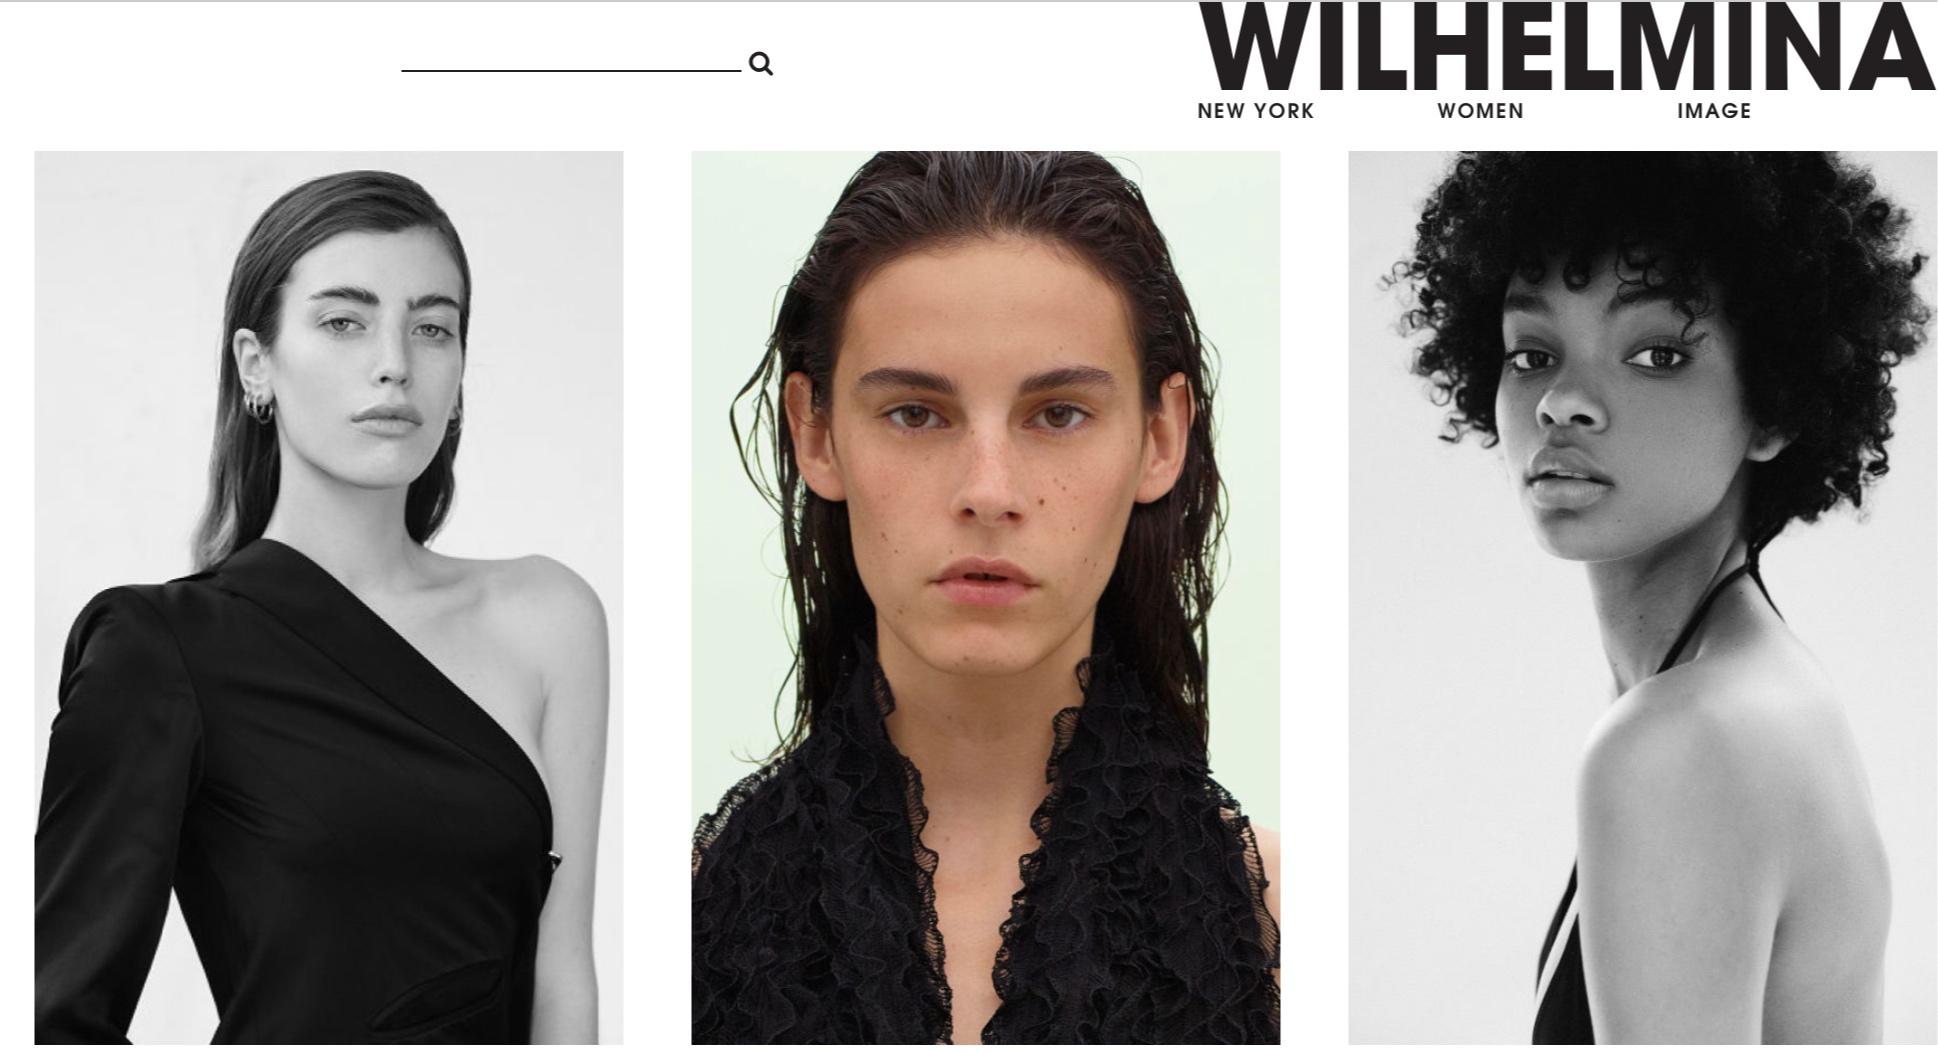 image: Wilhelmina